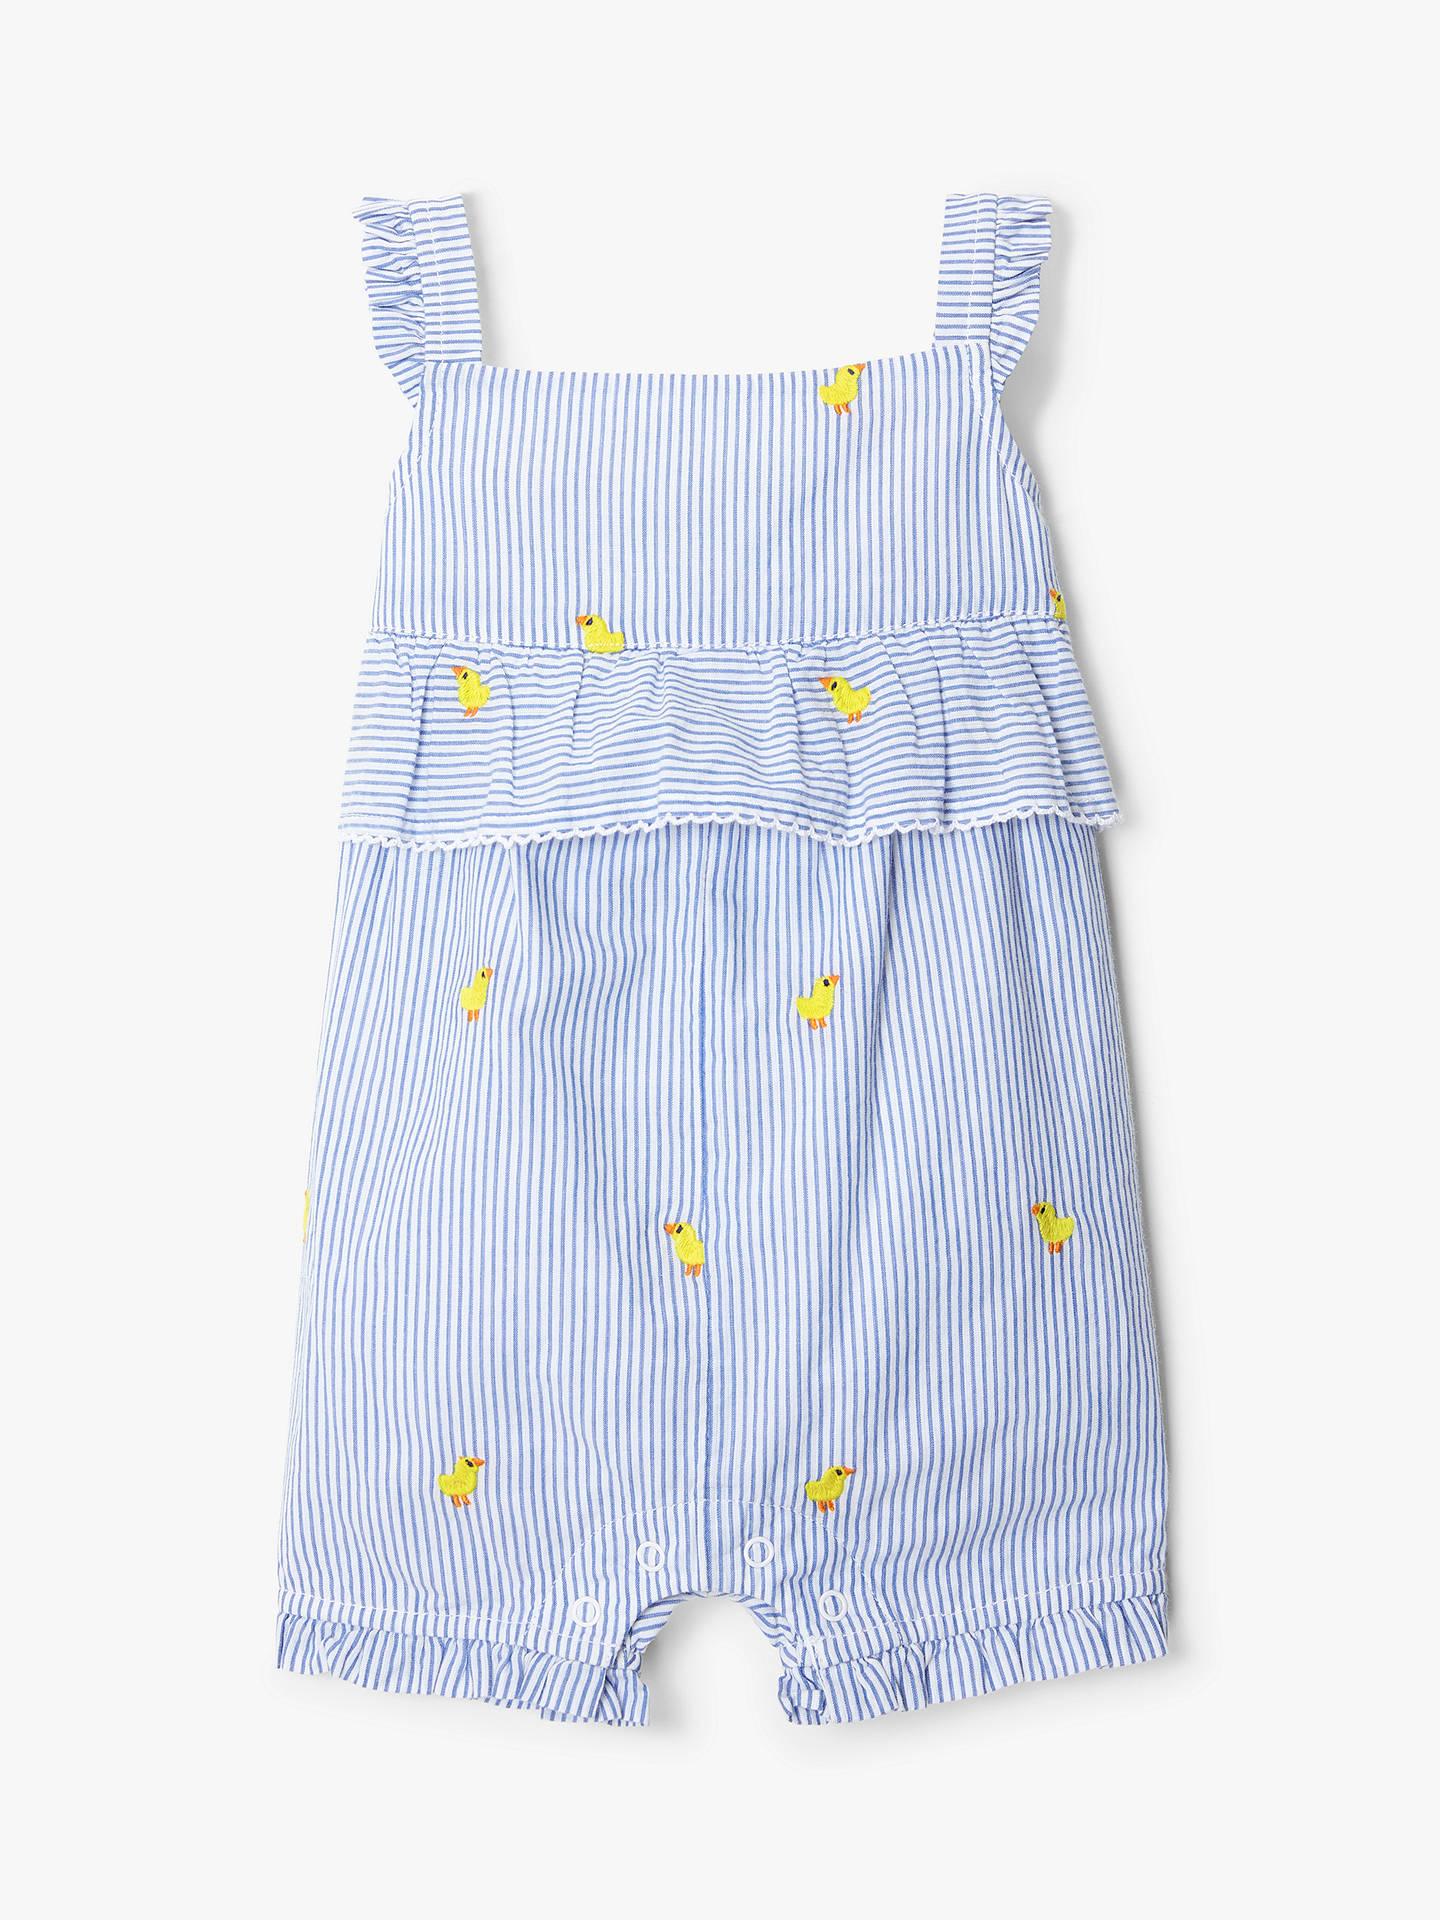 738bd5fb51 BuyJohn Lewis   Partners Baby Duck Embellished Stripe Romper